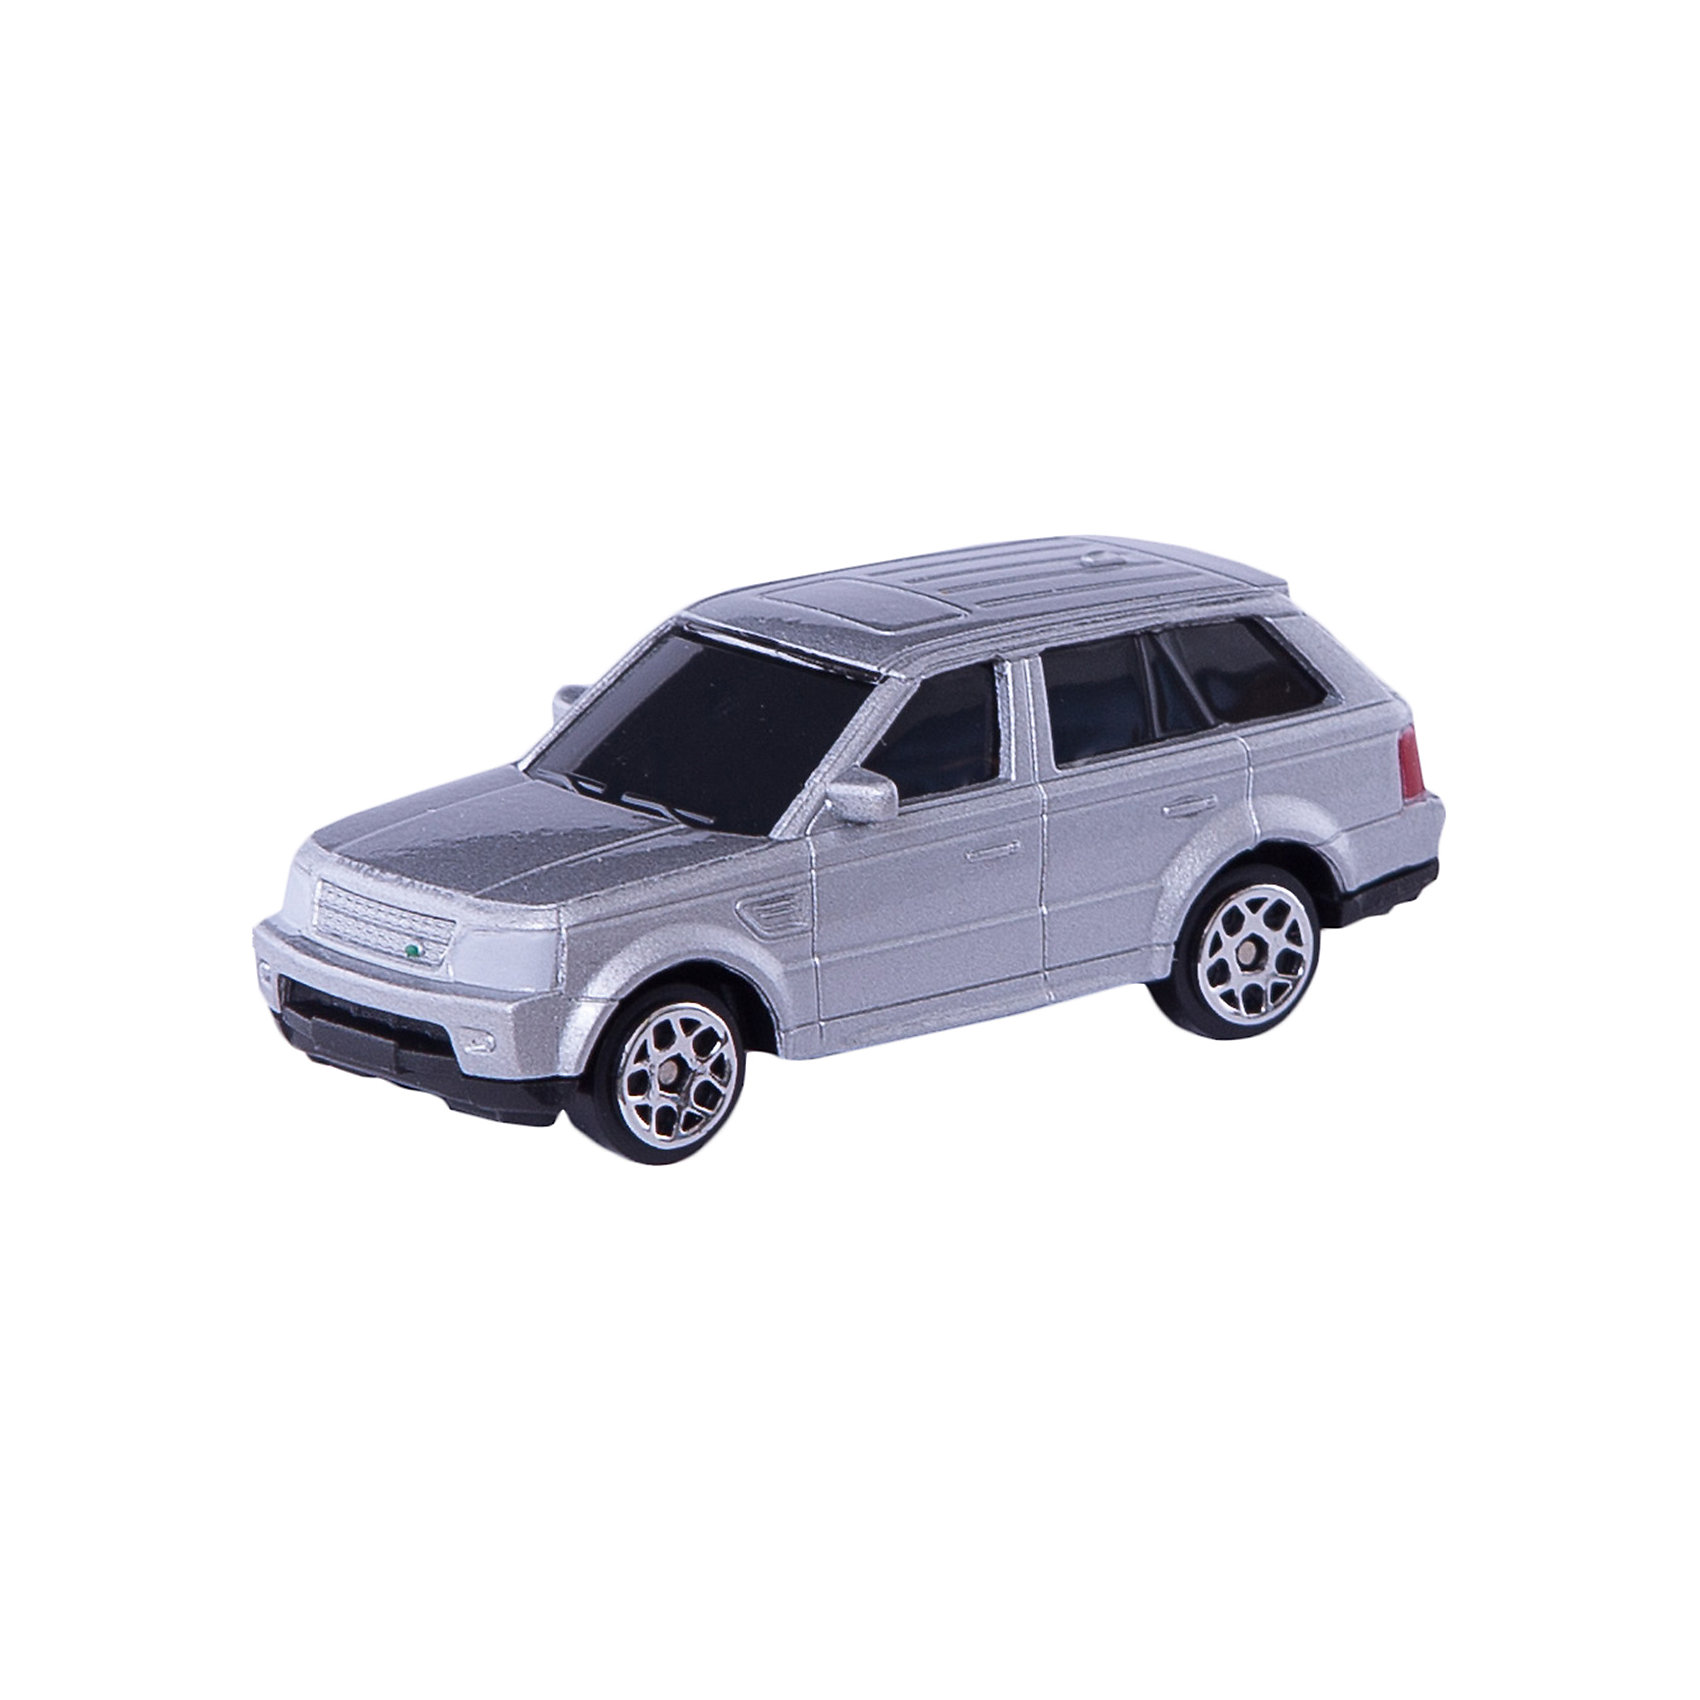 Машинка Land Rover Range Rover Sport Jeans 3, AutotimeМашинки<br><br><br>Ширина мм: 90<br>Глубина мм: 42<br>Высота мм: 40<br>Вес г: 14<br>Возраст от месяцев: 36<br>Возраст до месяцев: 2147483647<br>Пол: Мужской<br>Возраст: Детский<br>SKU: 5584066